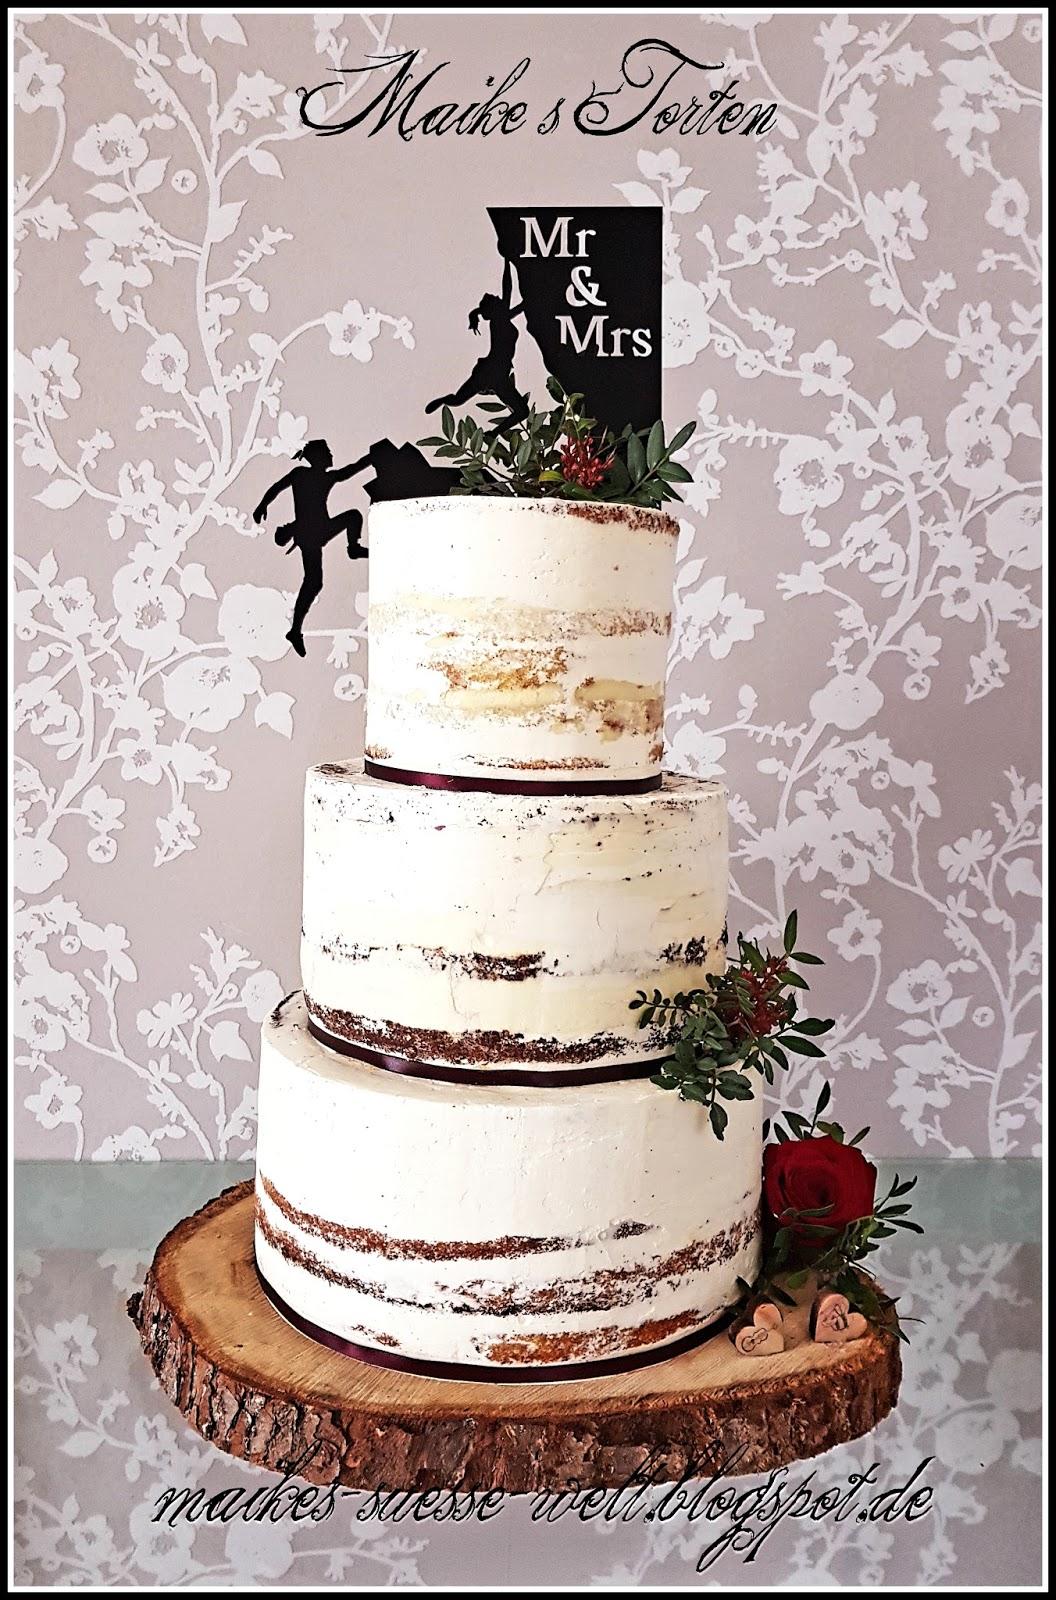 Maikes Süße Welt Semi Naked Cake Hochzeitstorte Rezept Schoko